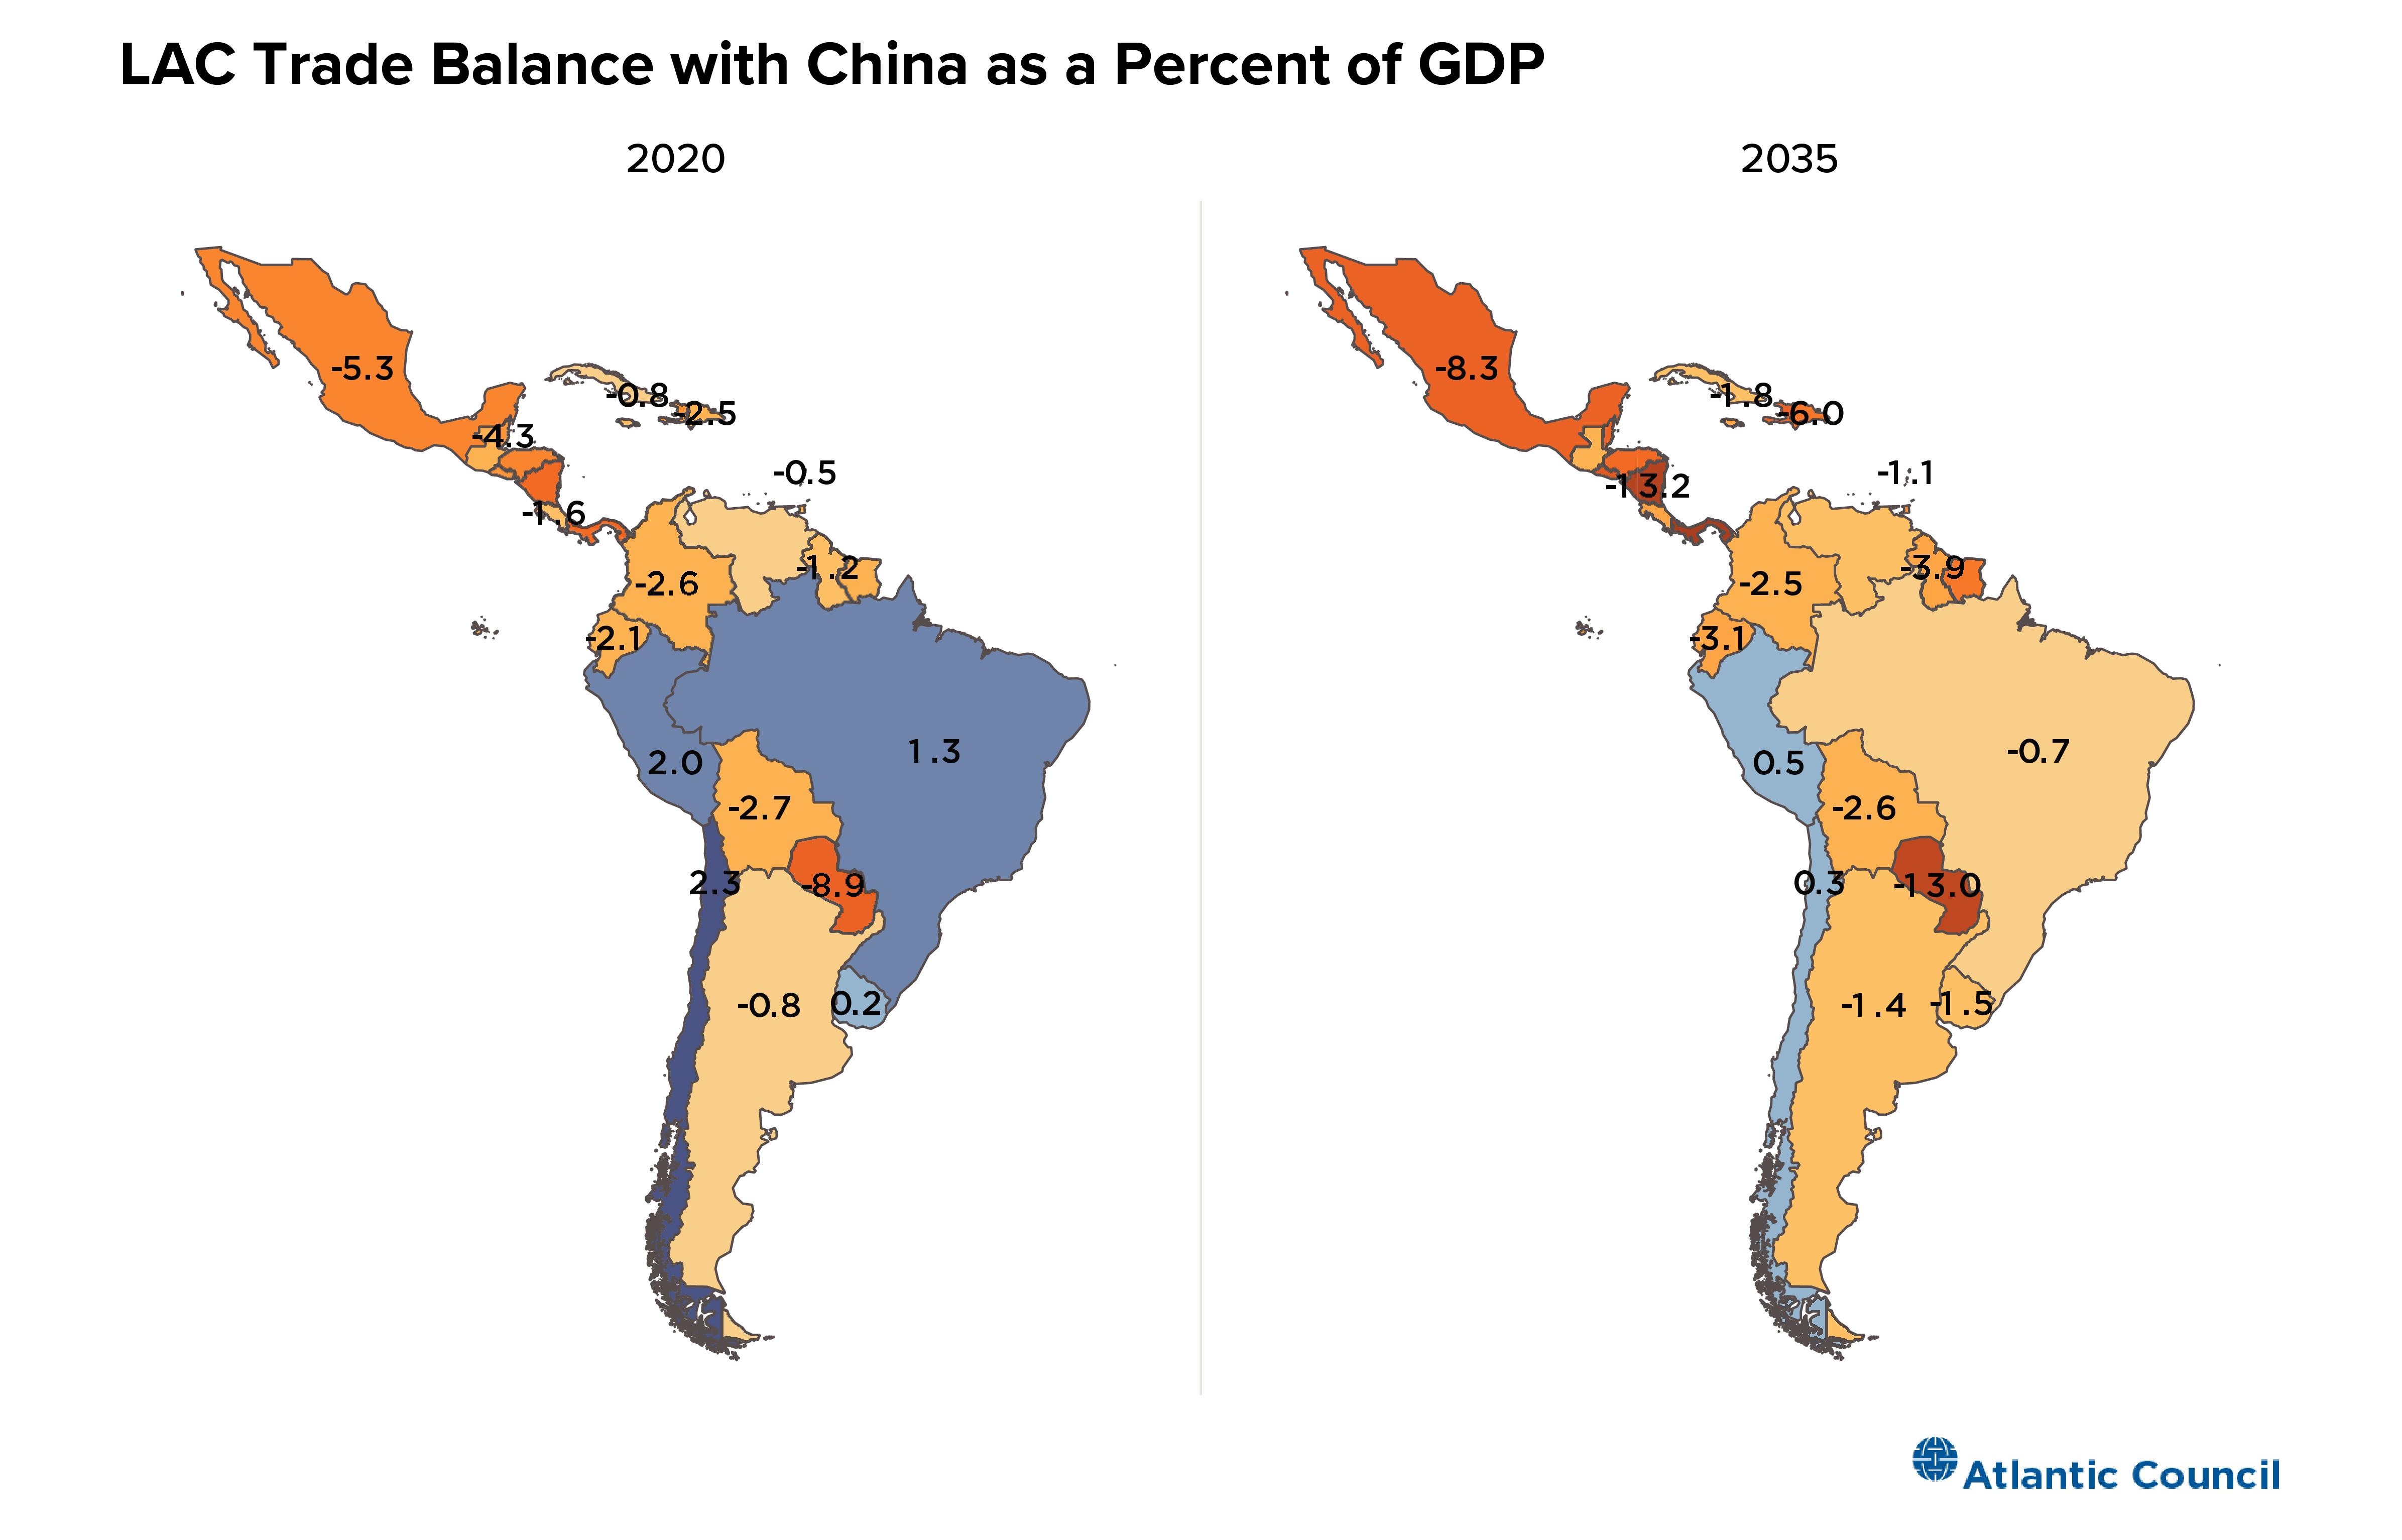 LAC trade balance with China in Balance Act scenario